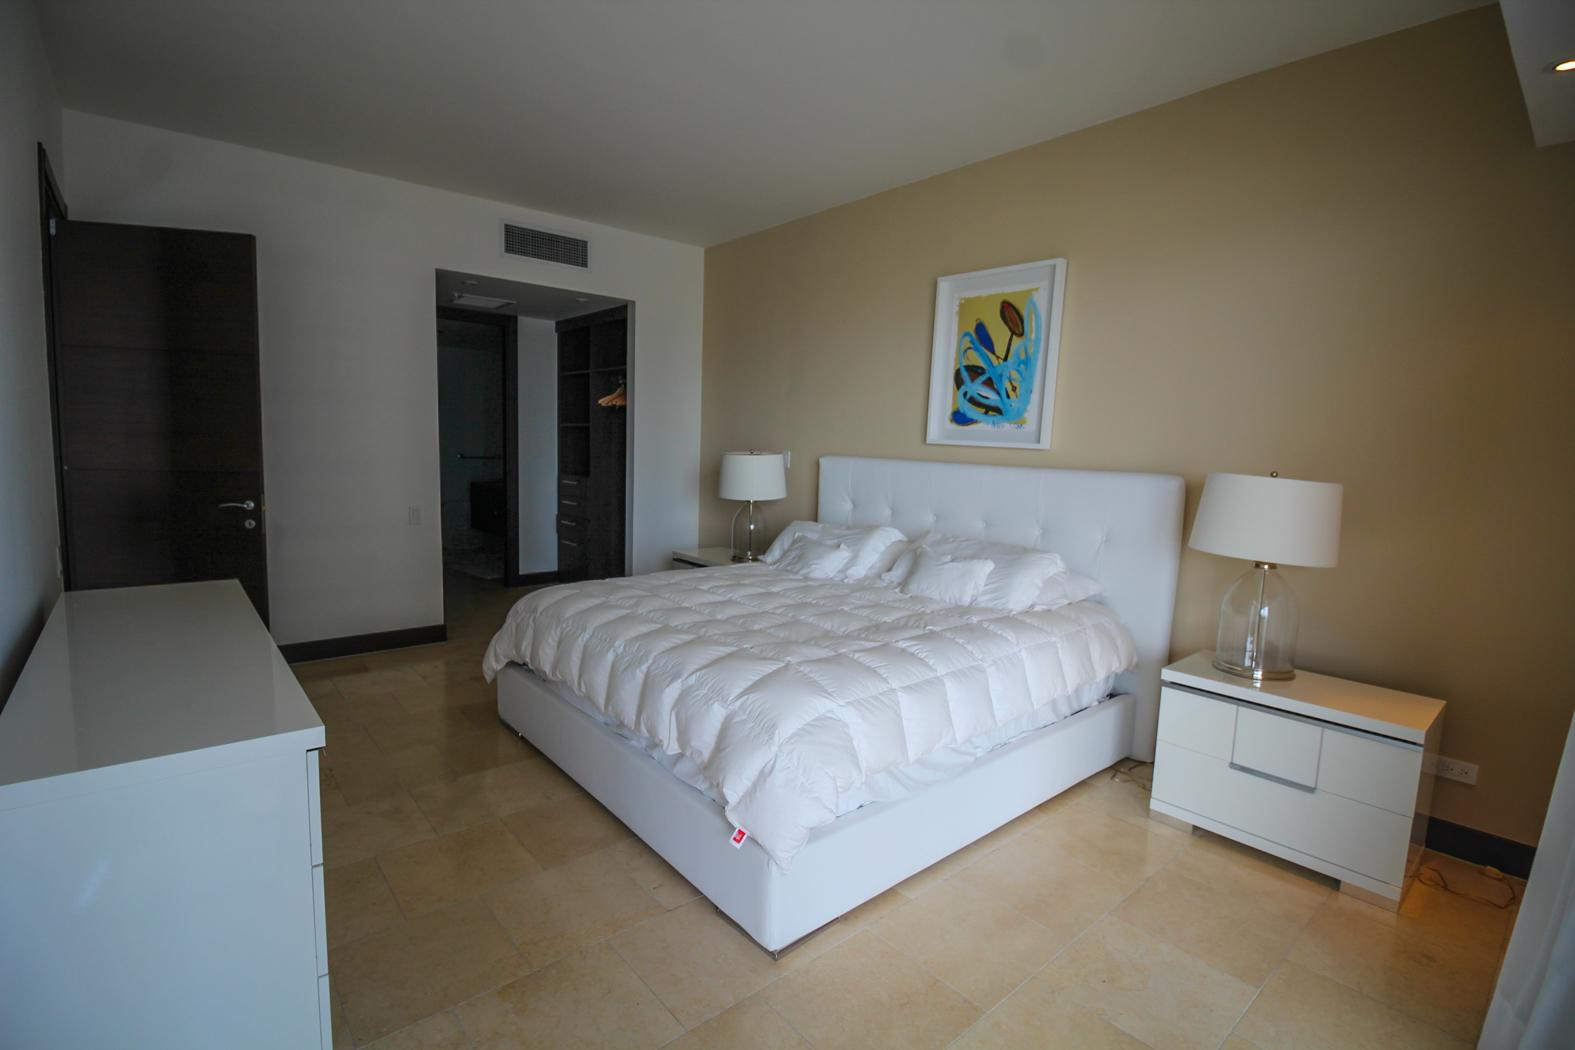 Punta-Pacifica-Panama-property-panamaequityjewel-oceanfront-trump-6.jpg